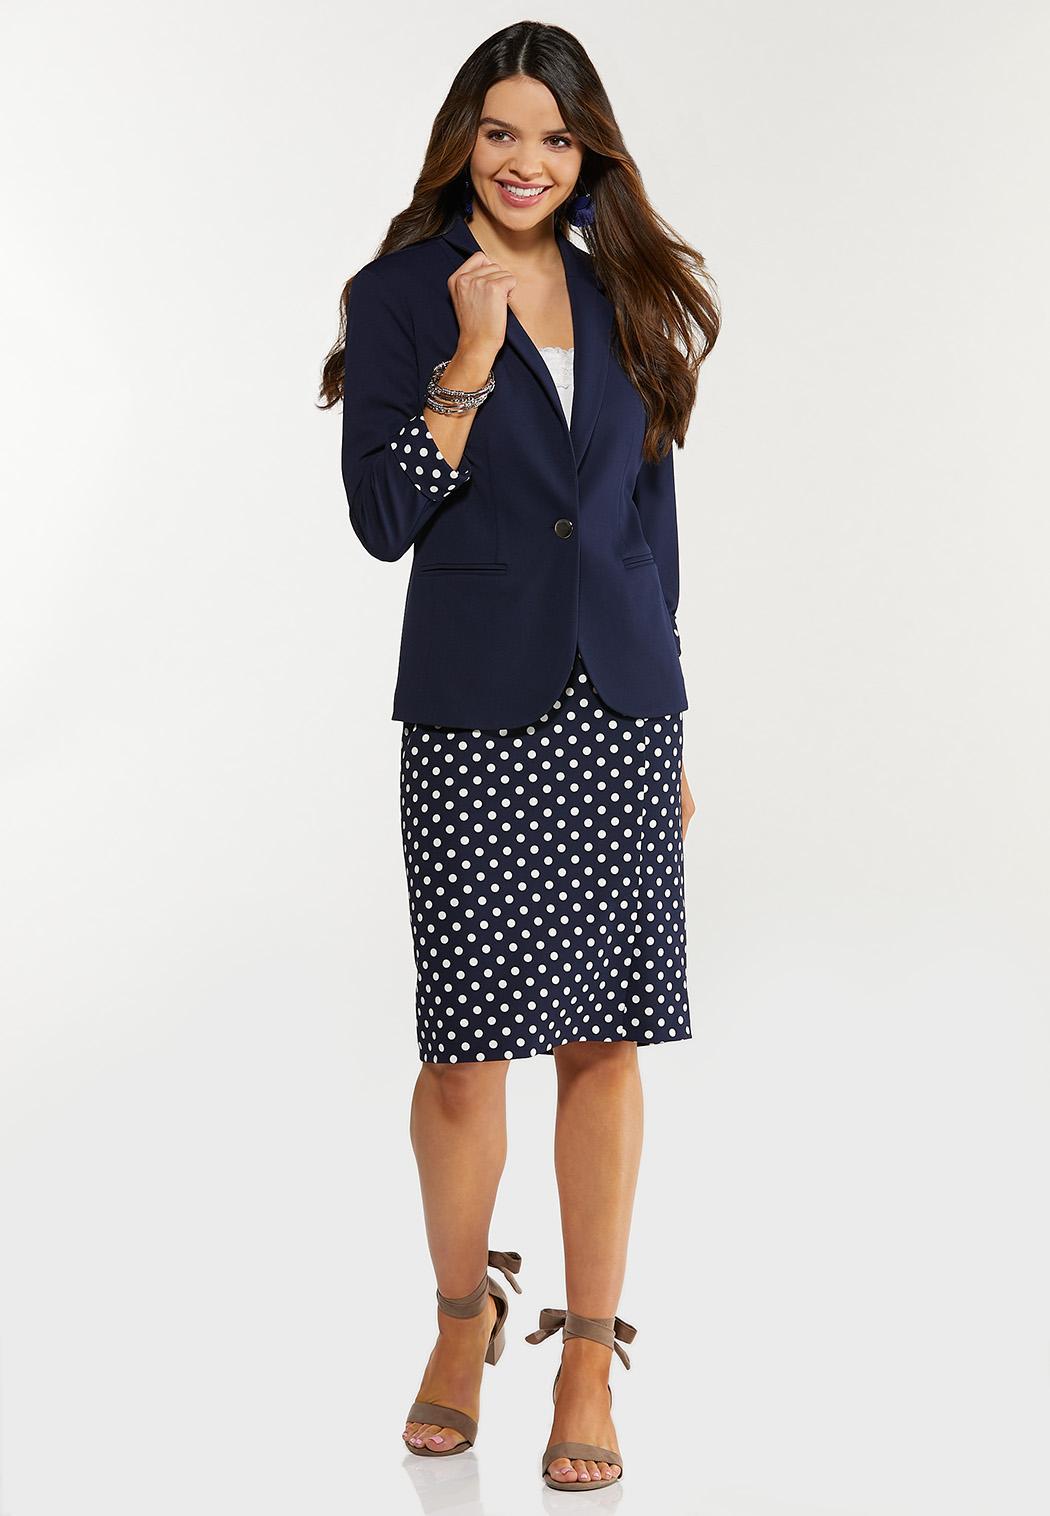 Plus Size Navy Polka Dot Pencil Skirt (Item #44469688)